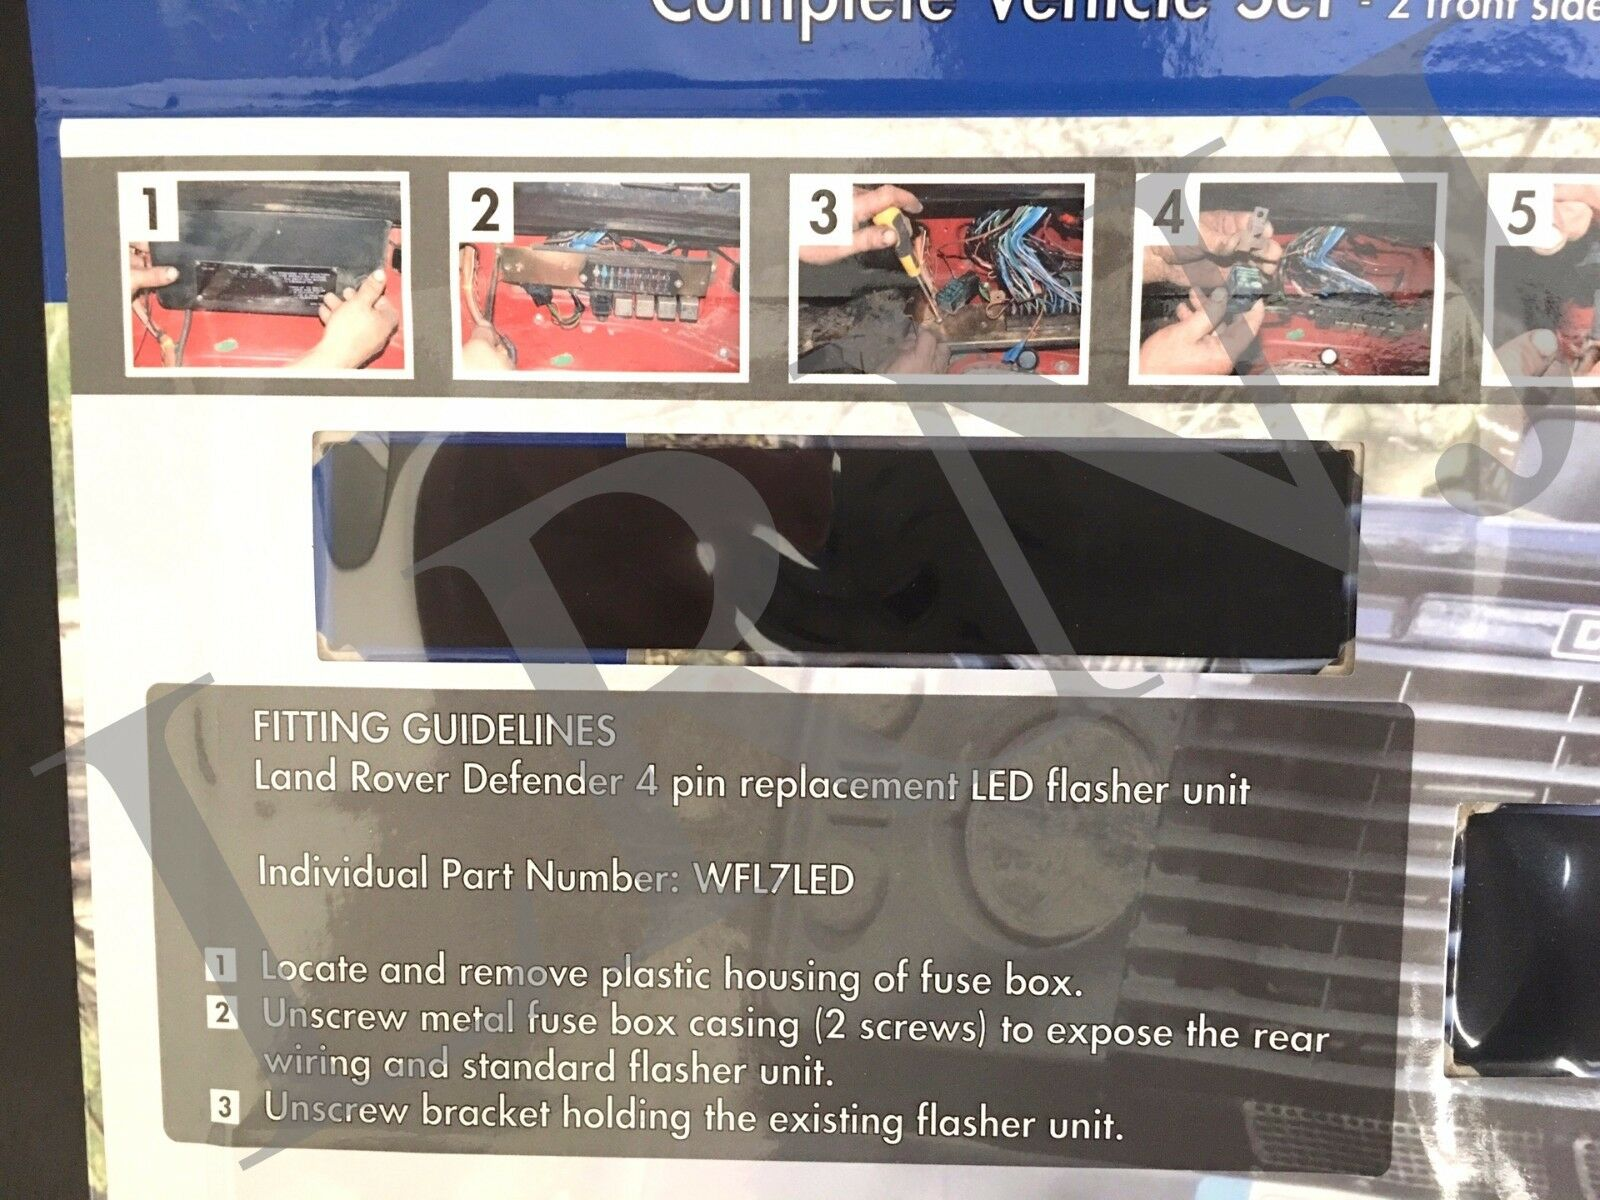 hight resolution of land rover defender britpart wipac led upgrade lamps kit 73 mm led style da1192 for sale online ebay